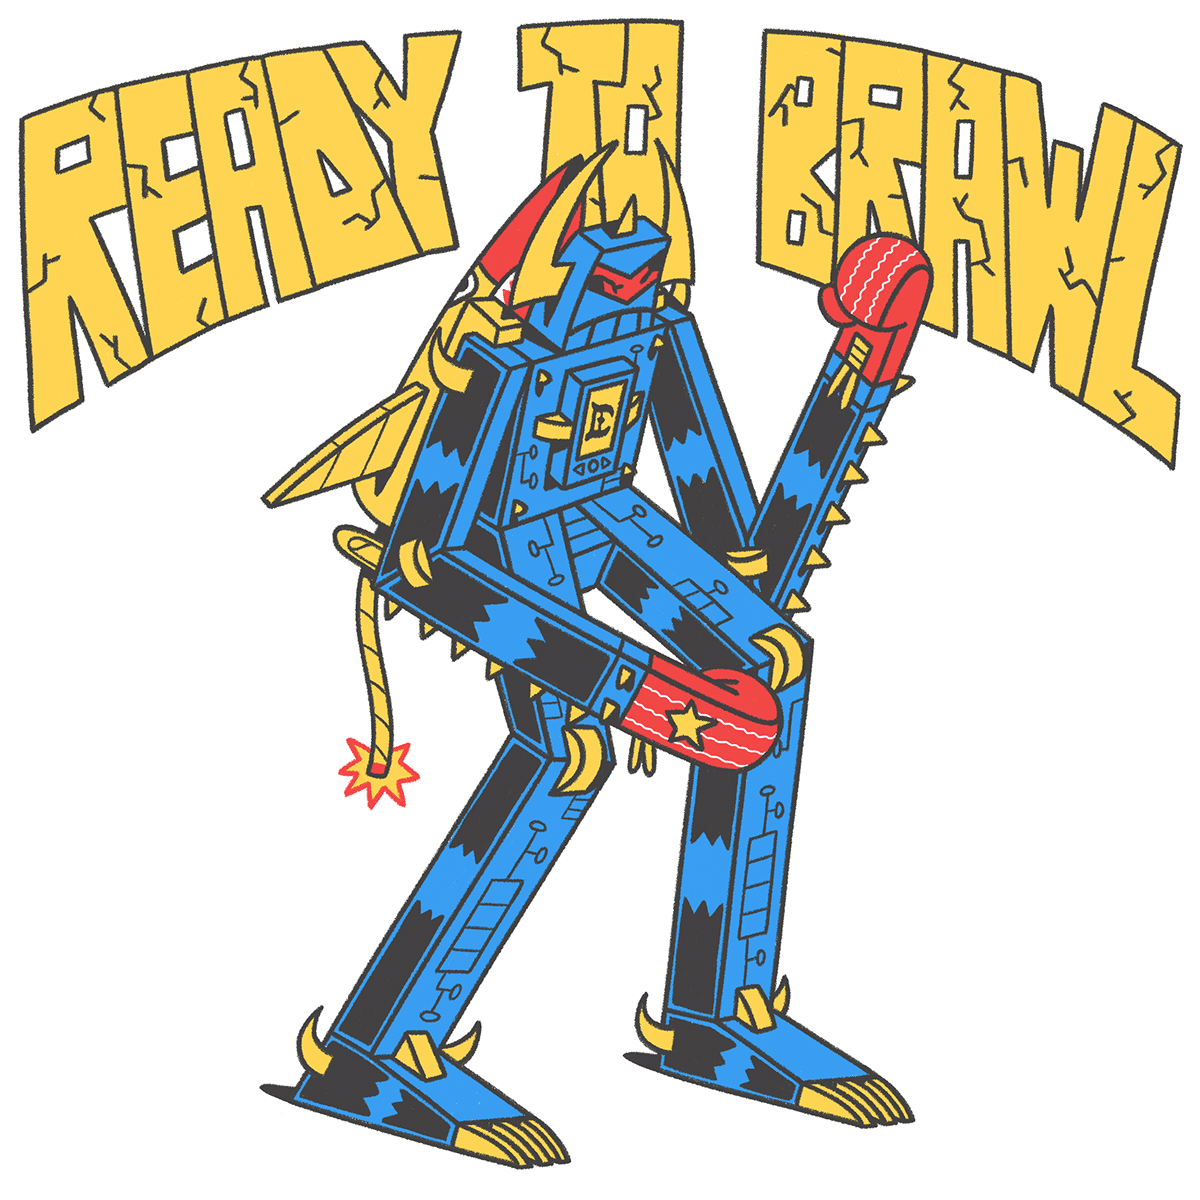 Cracklez graphic design  graphics ILLUSTRATION  illustrations photoshop poster robots t-shirt tshirt